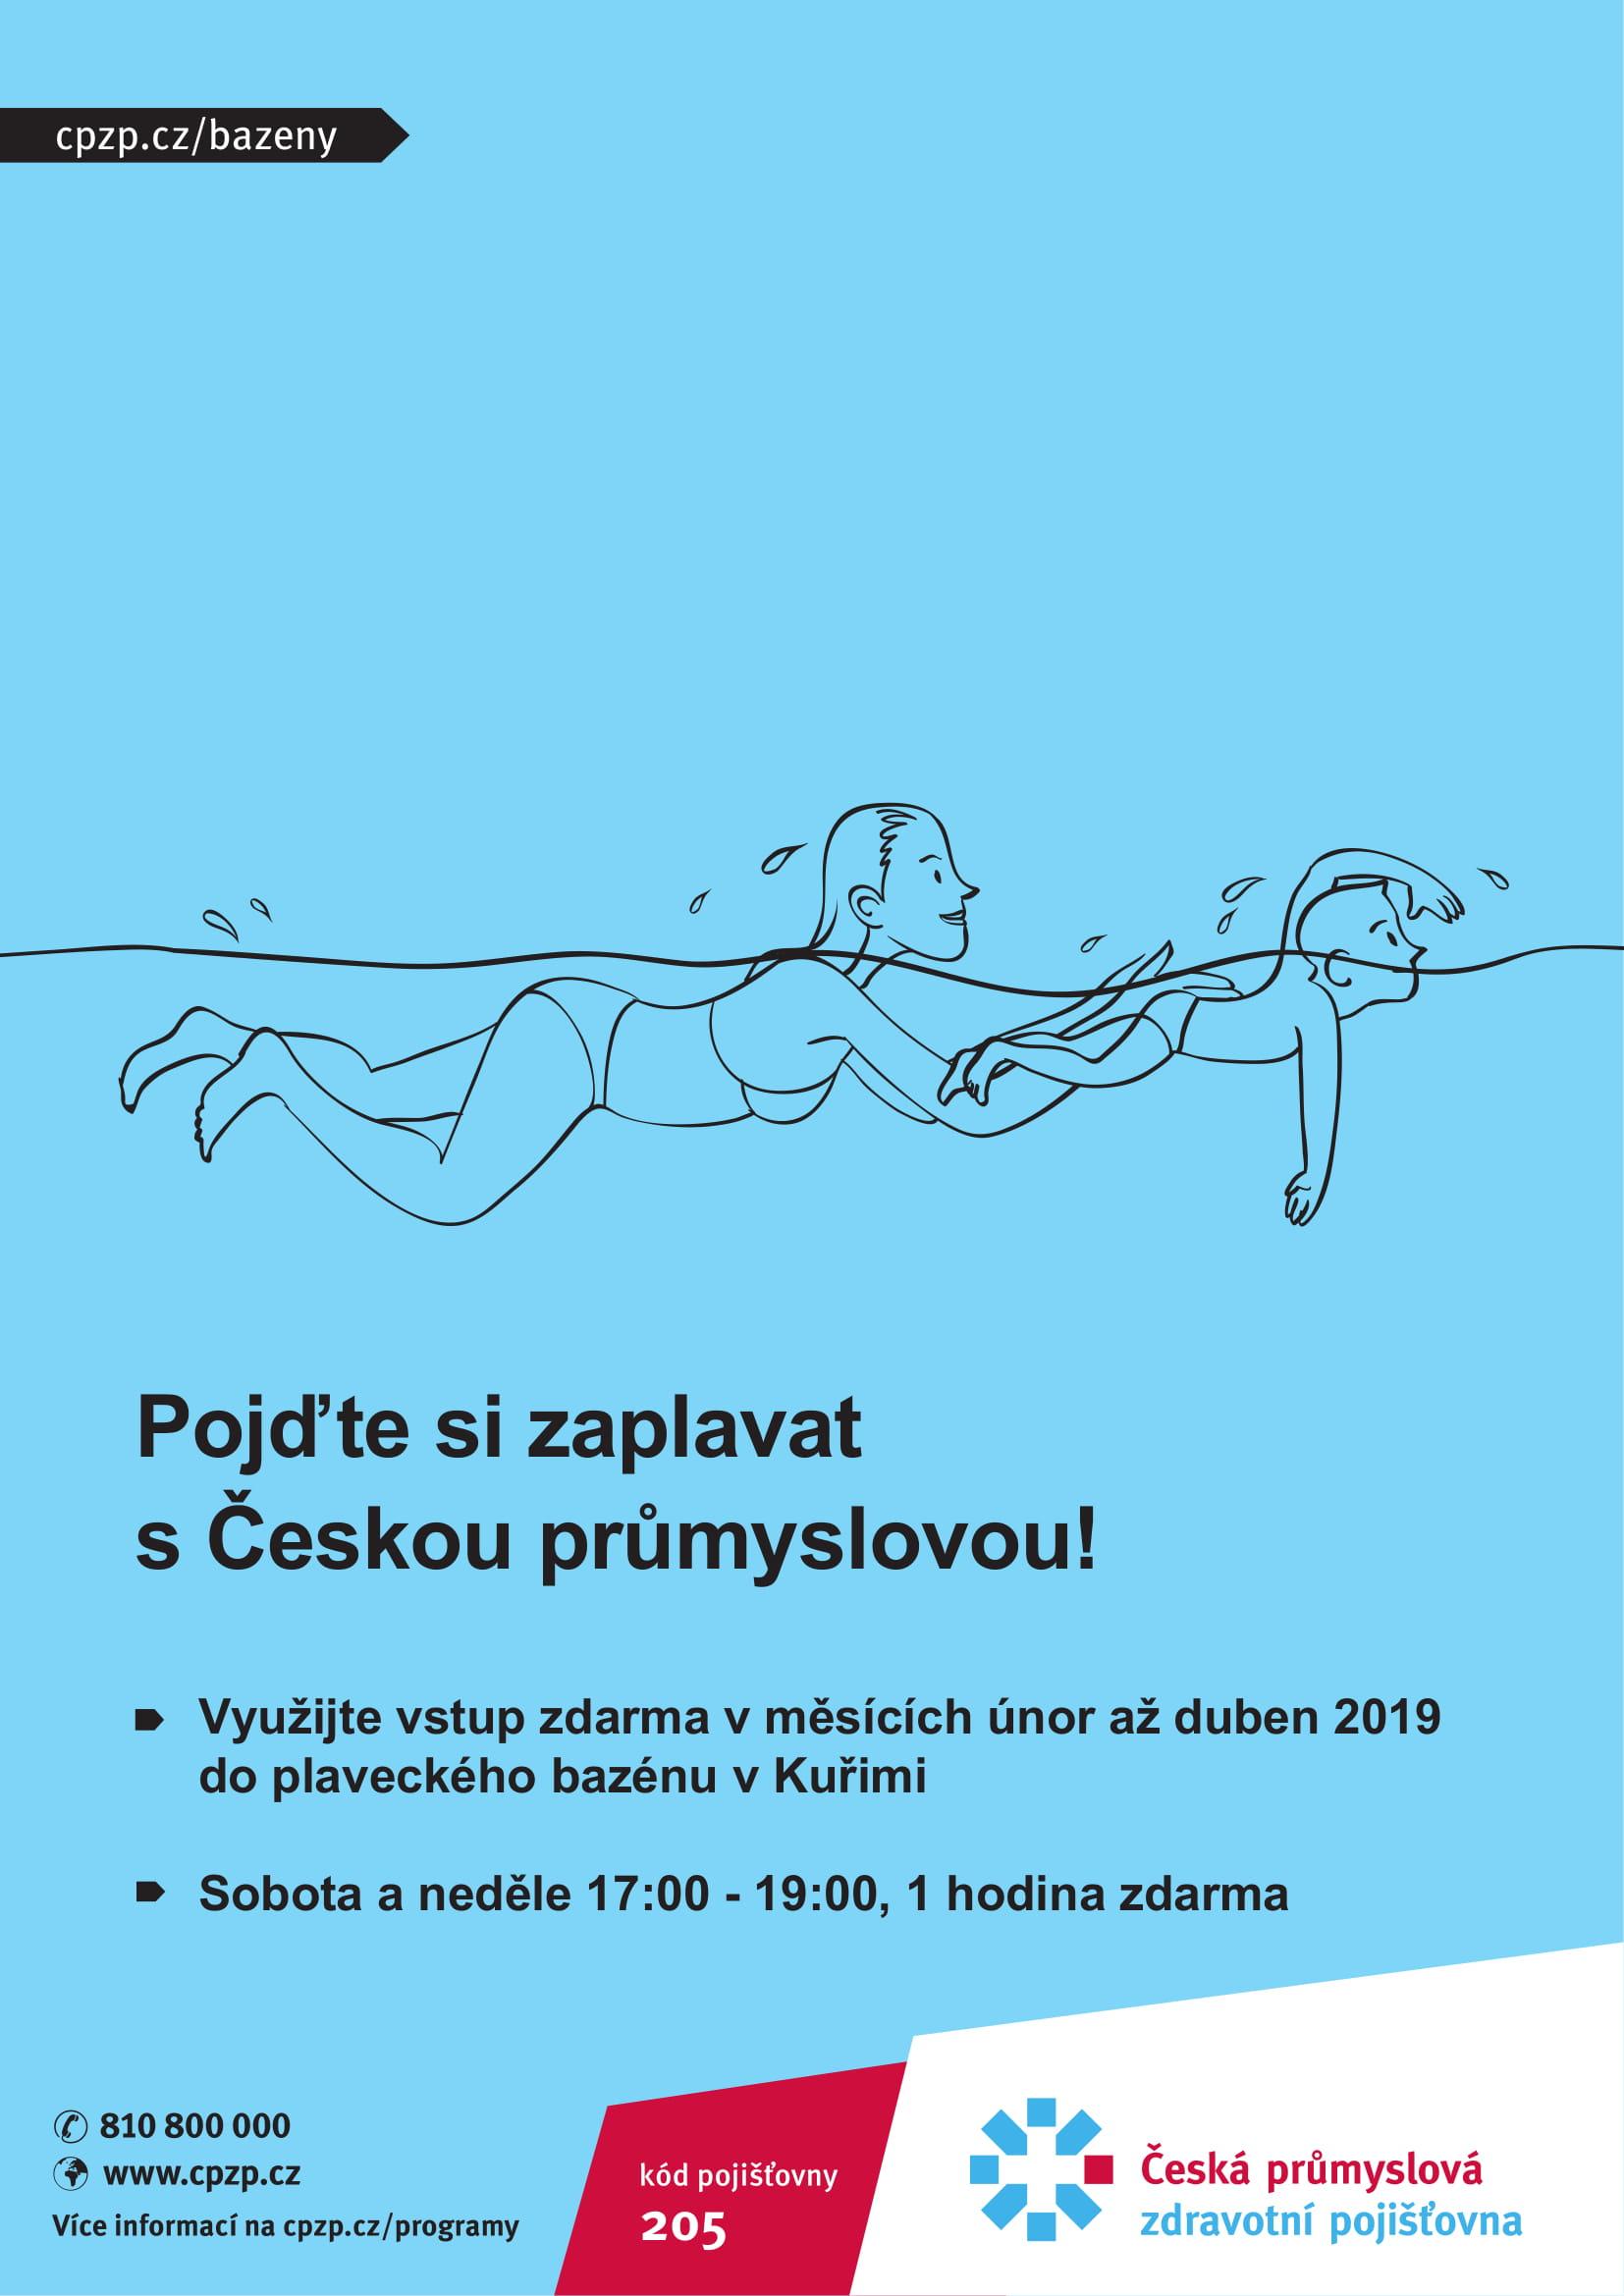 Plavani Pro Pojistence Cpzp Na Hodinku Zdarma Unor Duben 2019